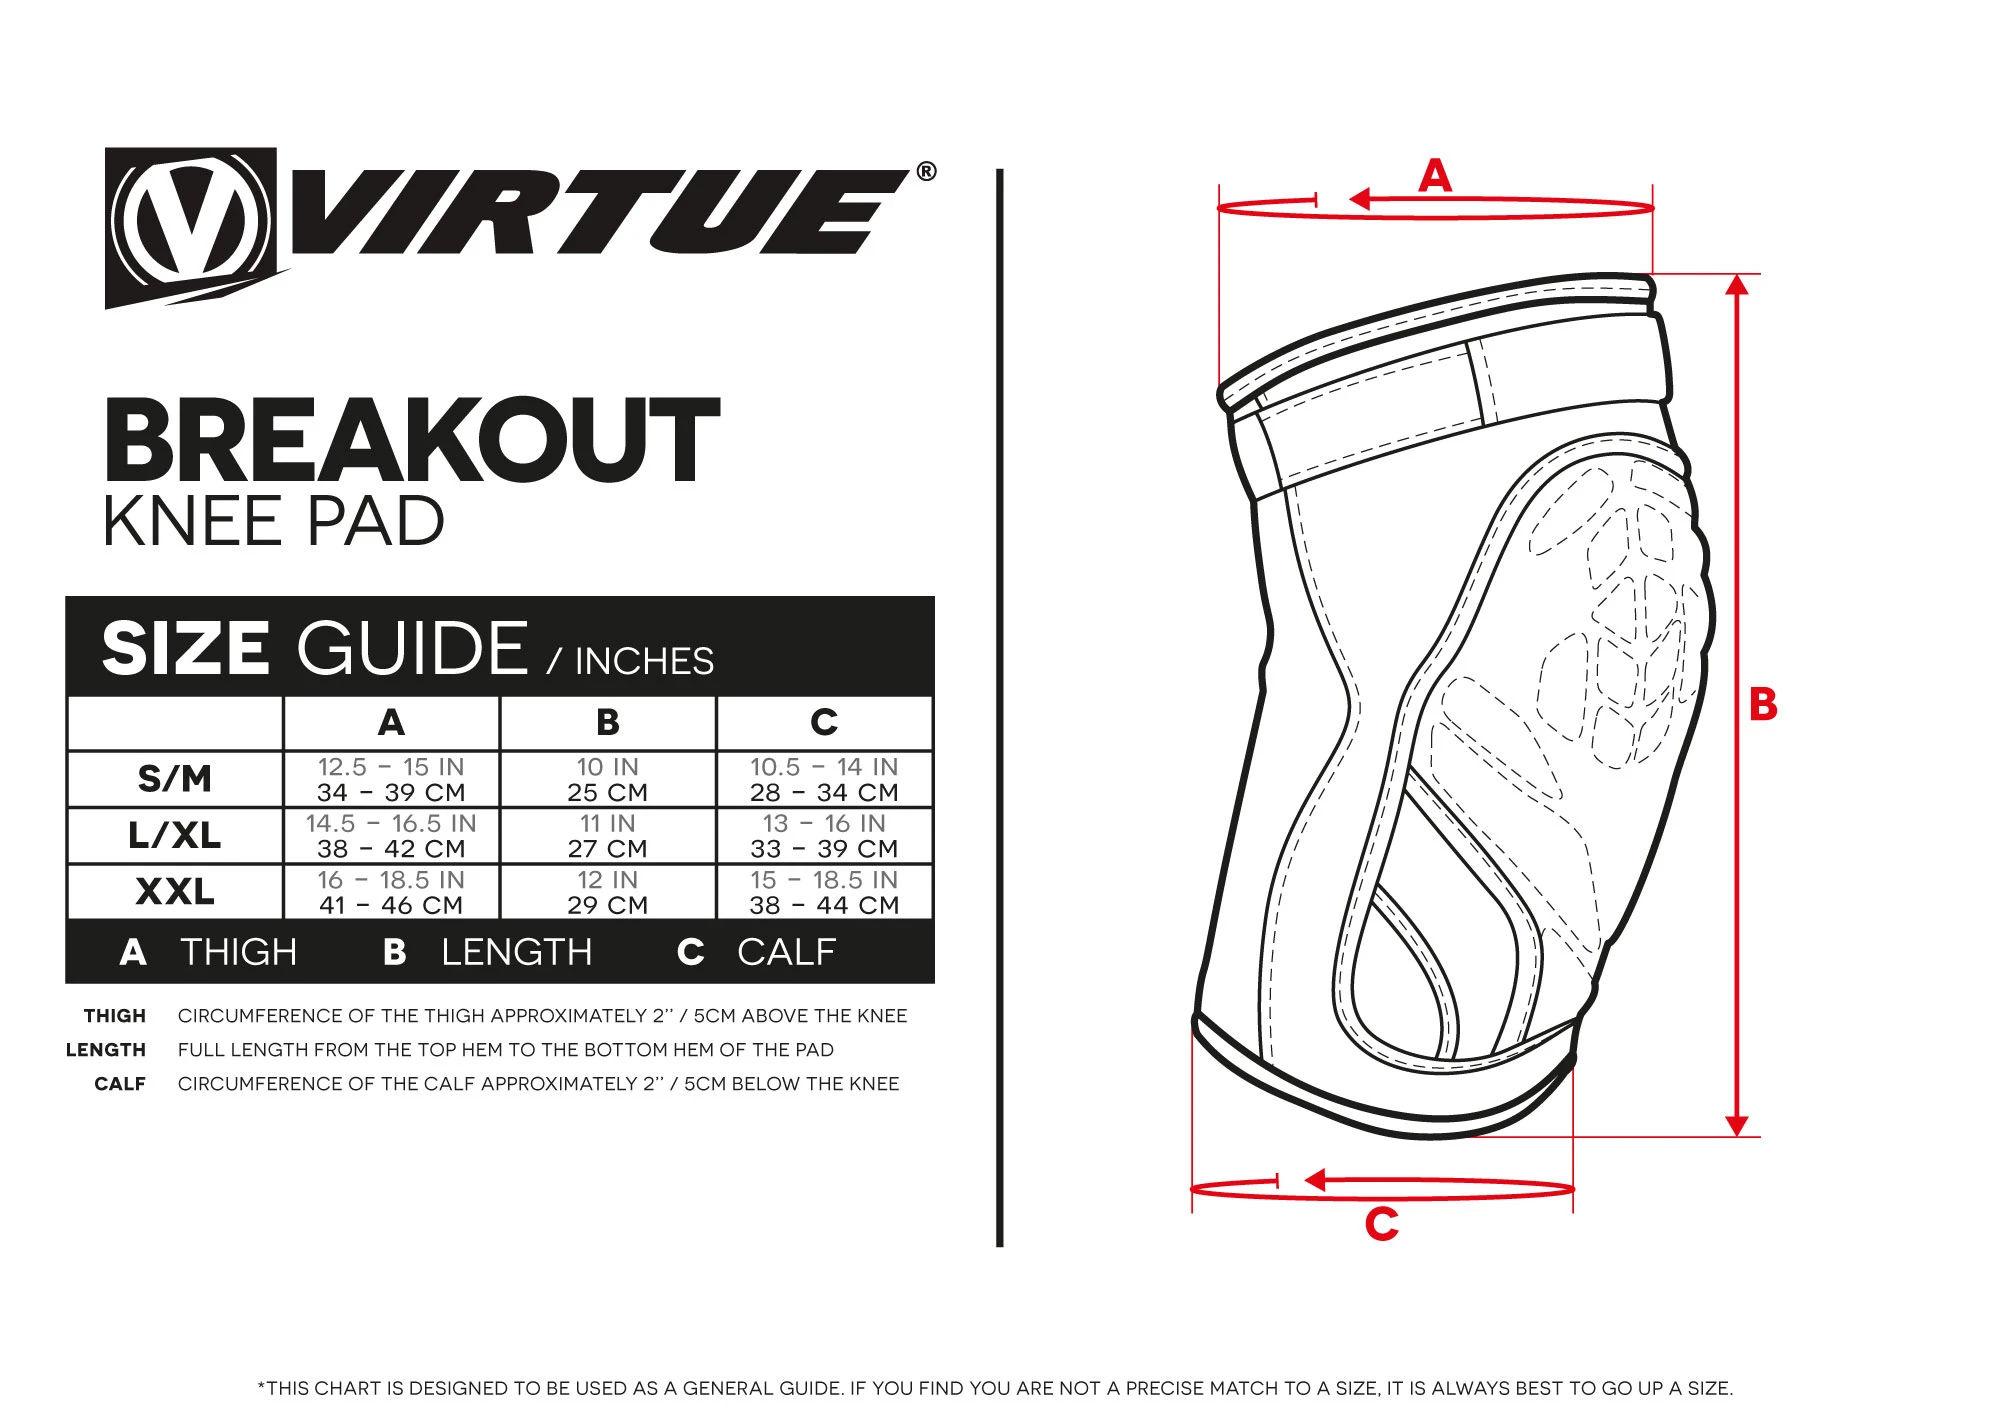 Virtue Breakout Knee Pads